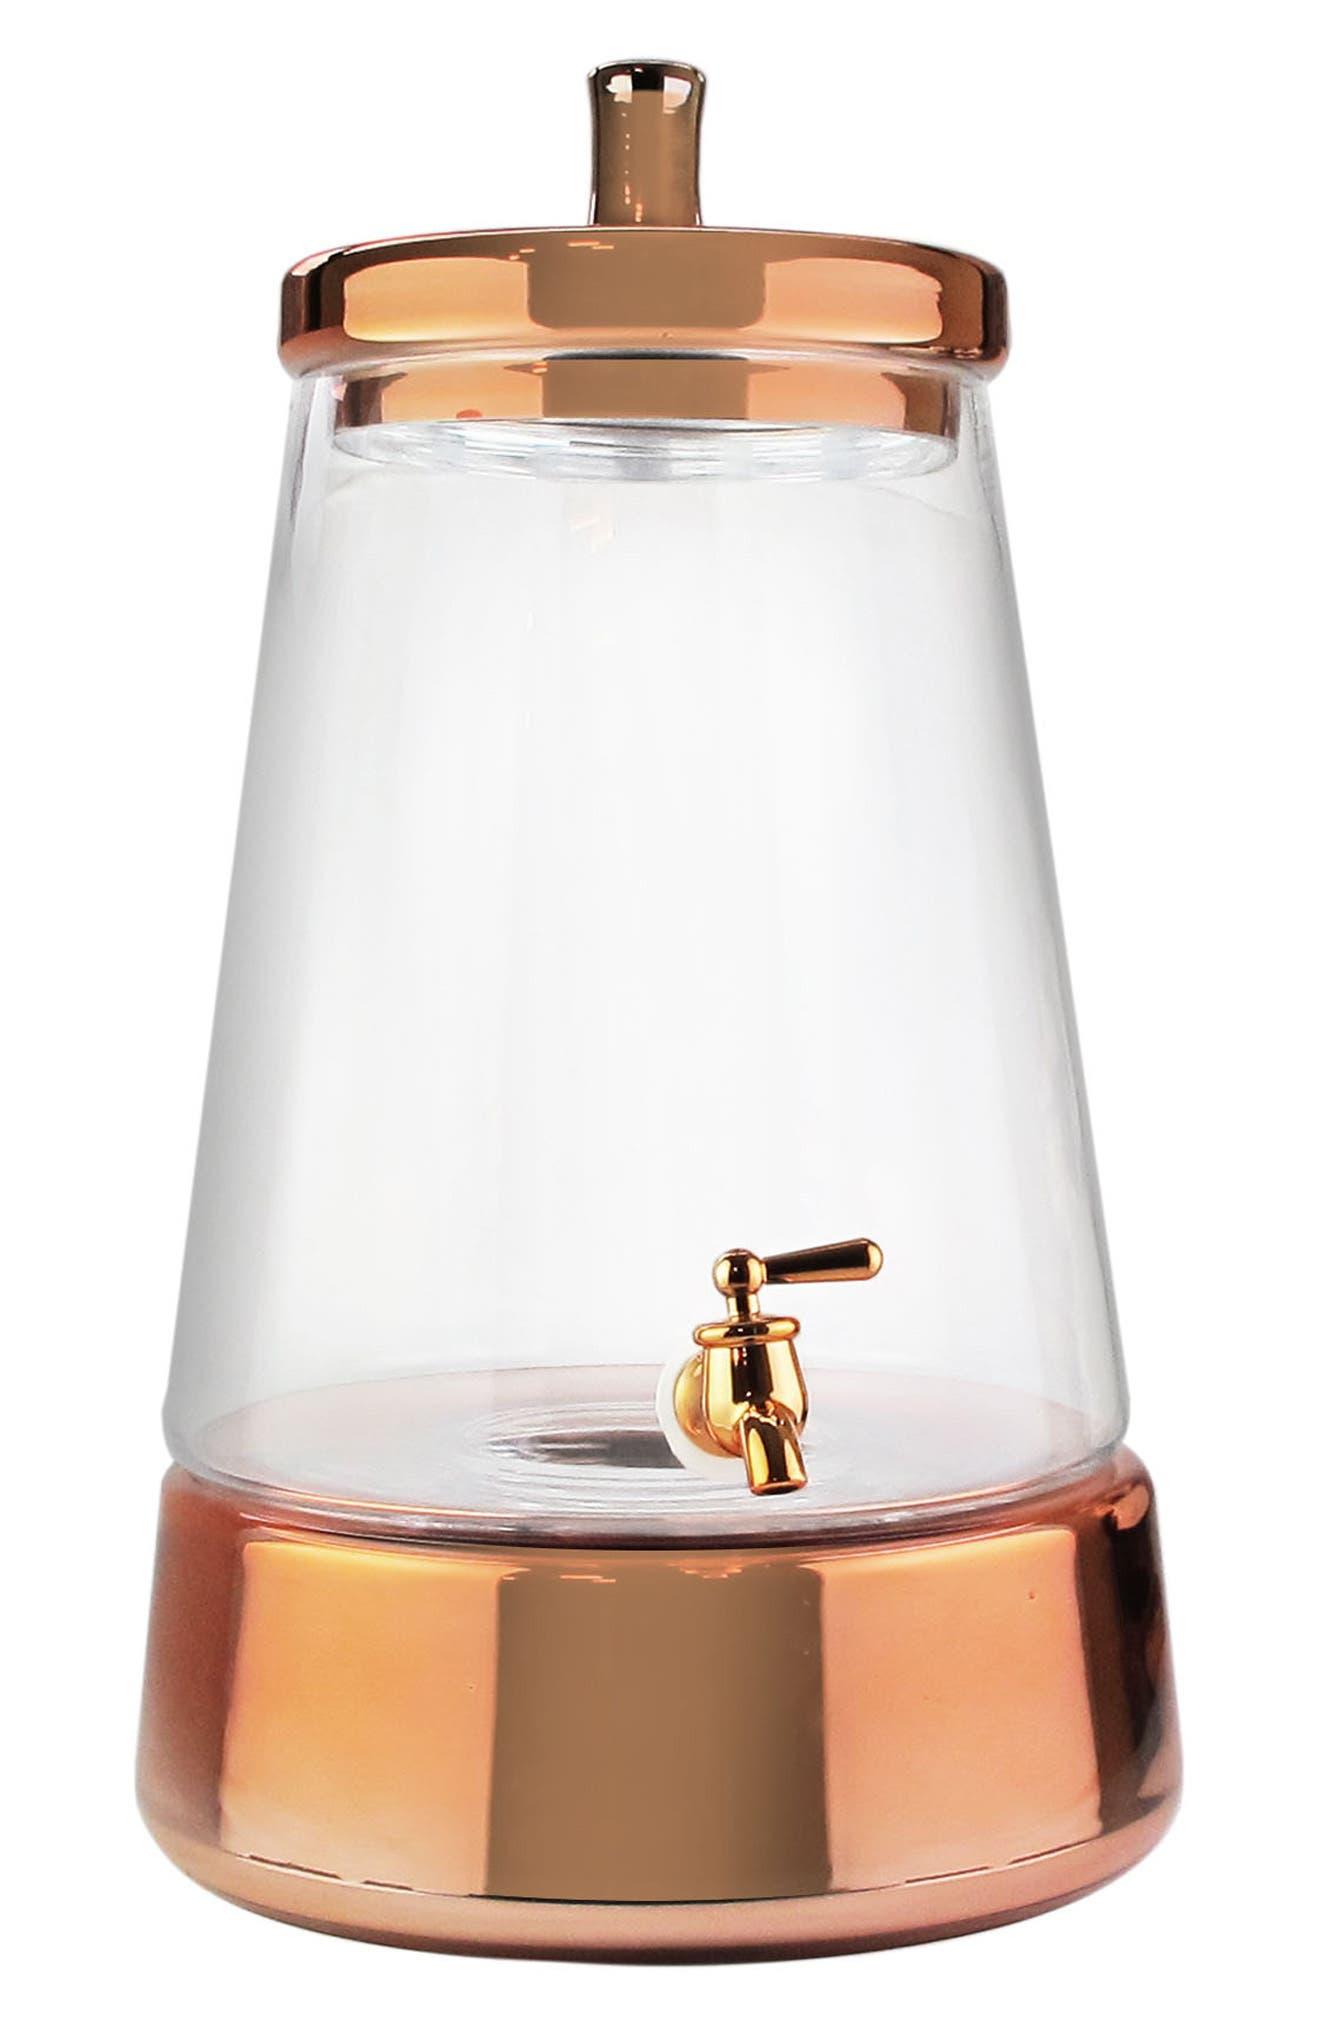 Metallic Beverage Dispenser,                             Main thumbnail 1, color,                             COPPER